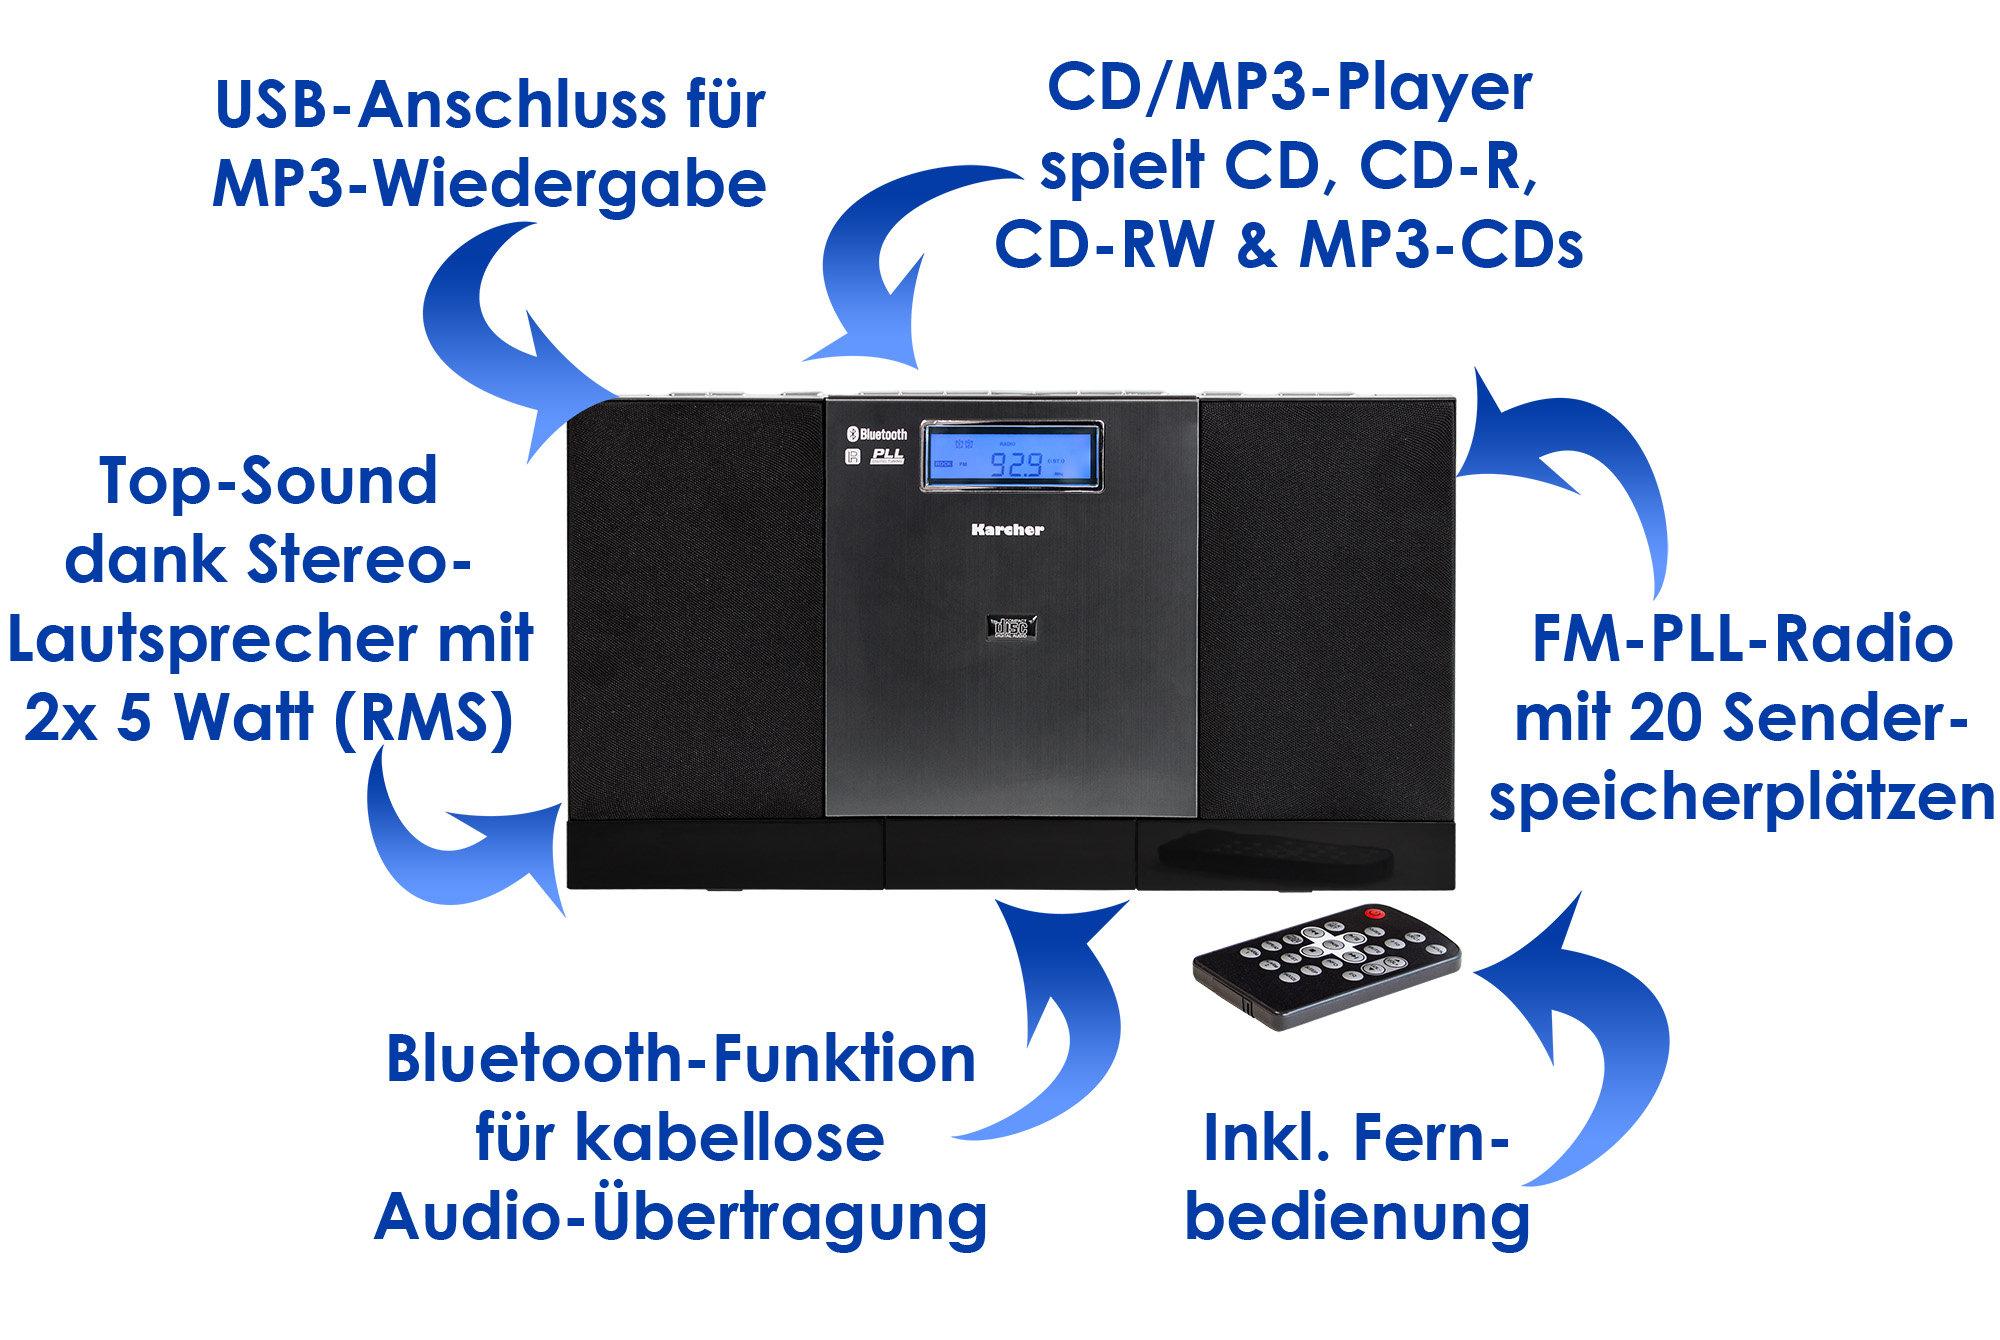 karcher mc 6540bt musik center bluetooth cd player mp3. Black Bedroom Furniture Sets. Home Design Ideas